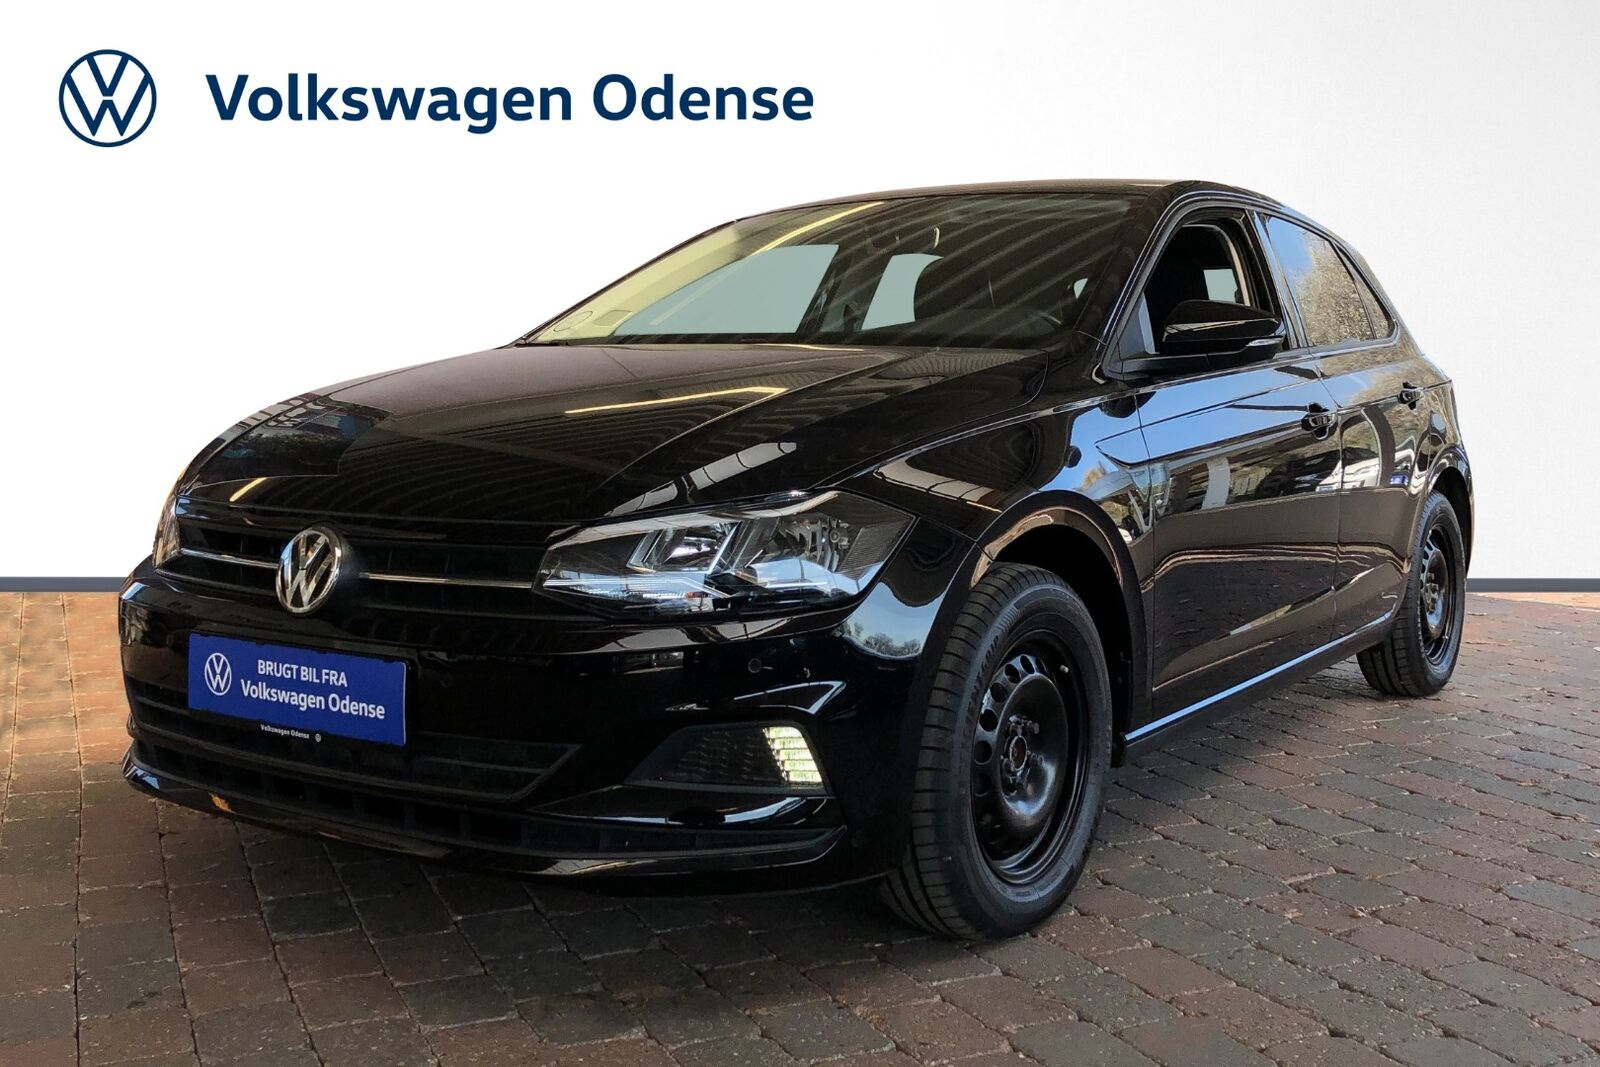 VW Polo 1,0 TSi 95 Comfortline 5d - 179.900 kr.